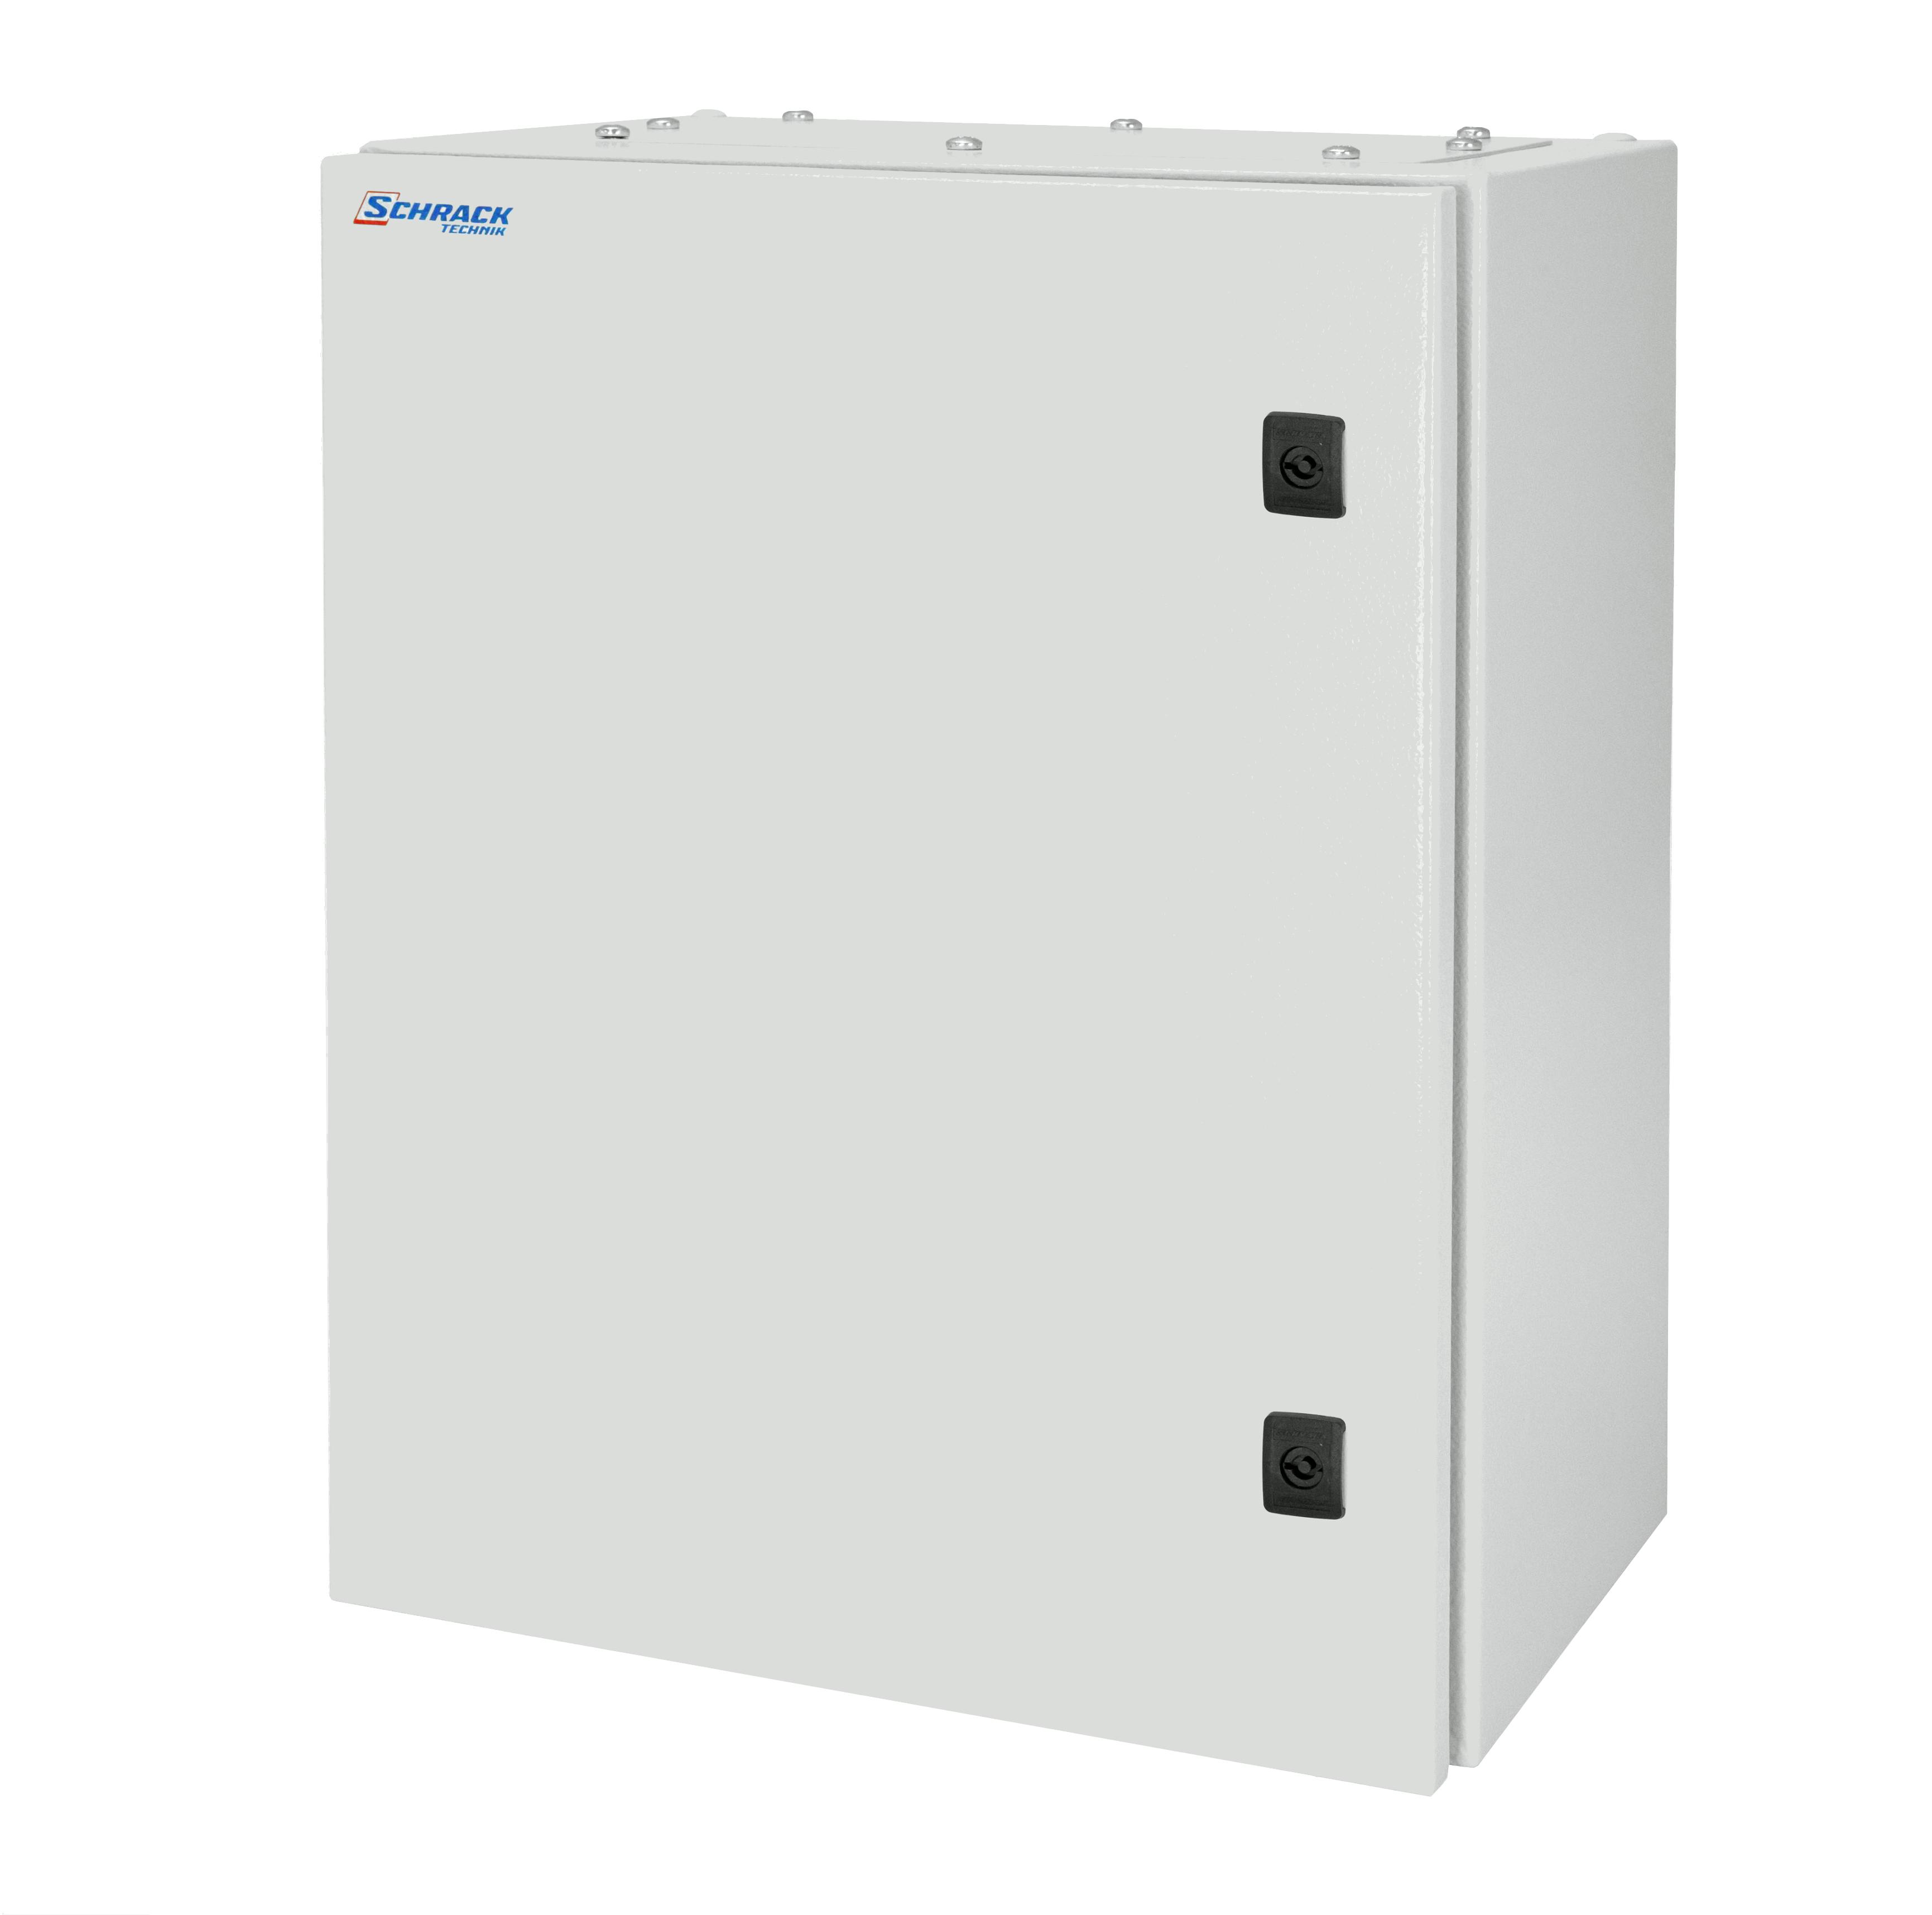 1 Stk Wandschrank Mono IP66 H=800 B=600 T=210 Stahlblech WSM8060210